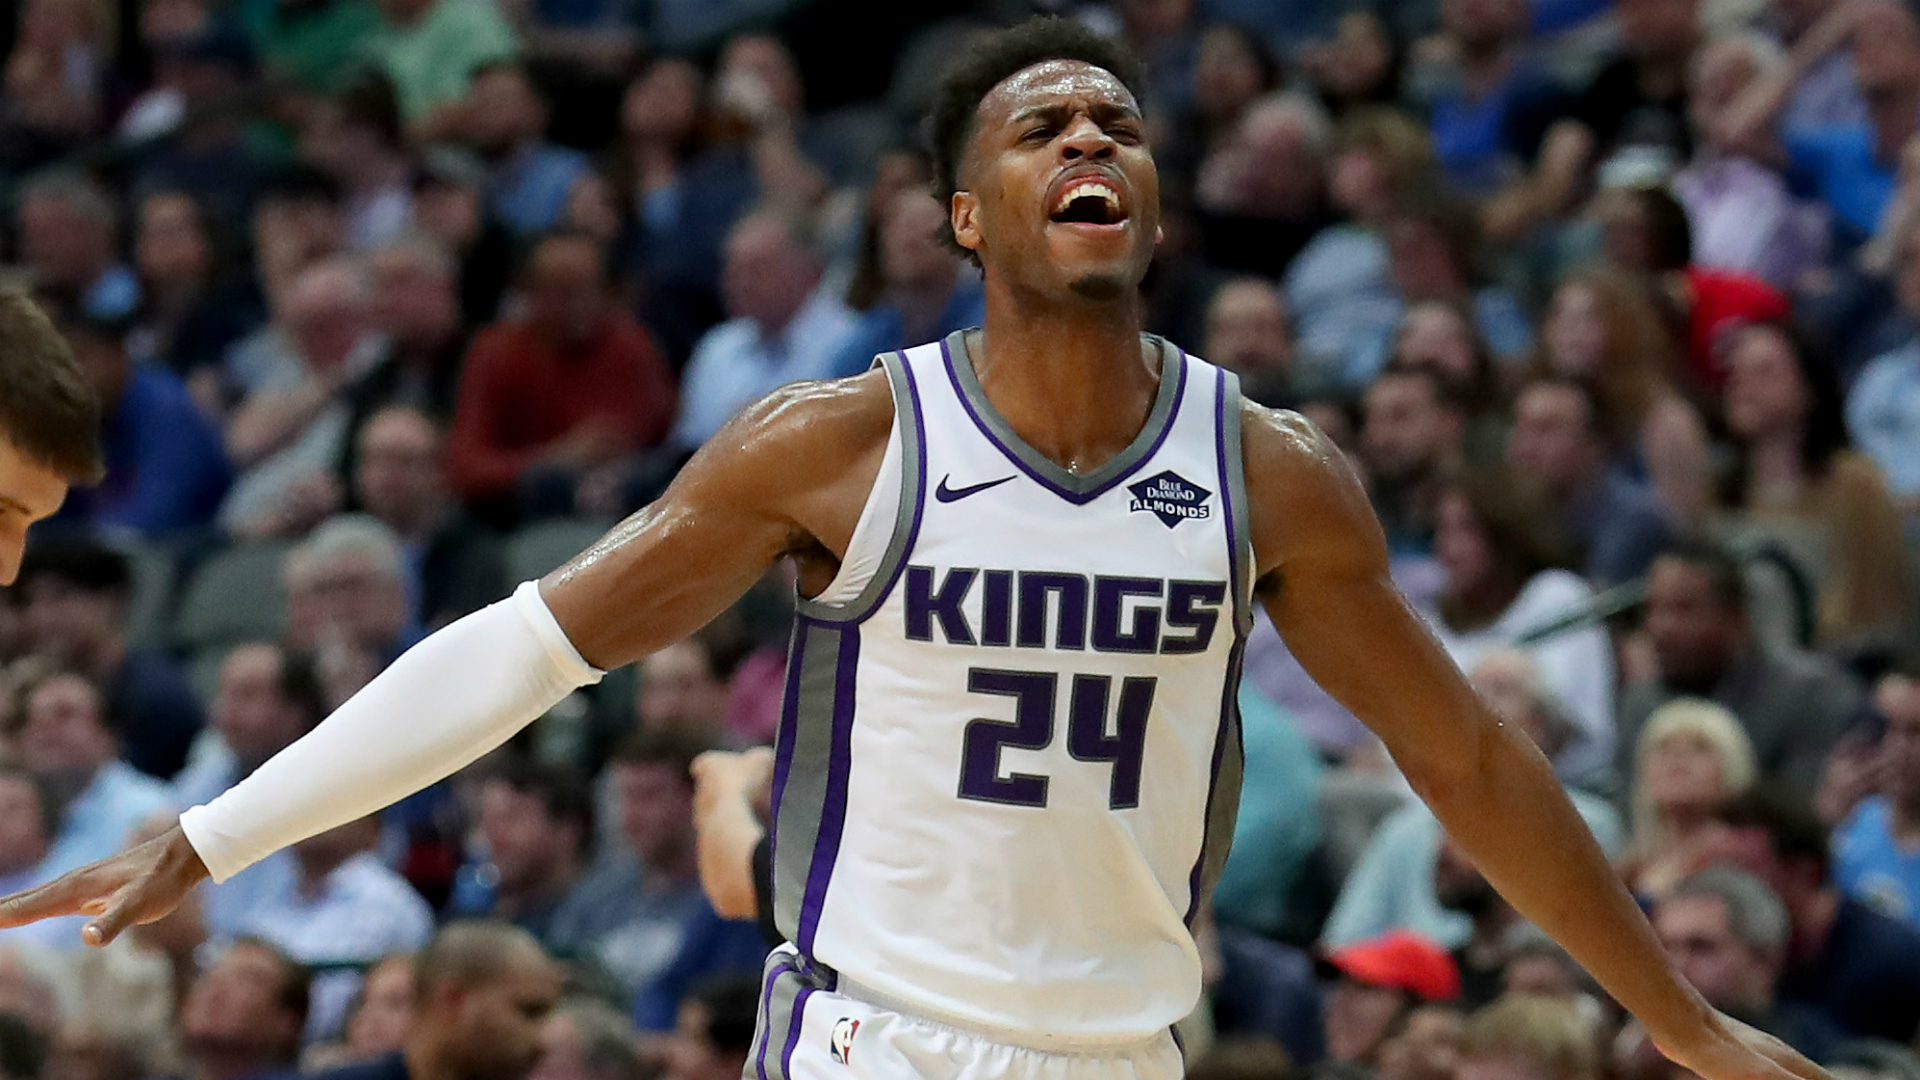 Kings snap Celtics' 10-game winning streak, LeBron leads Lakers